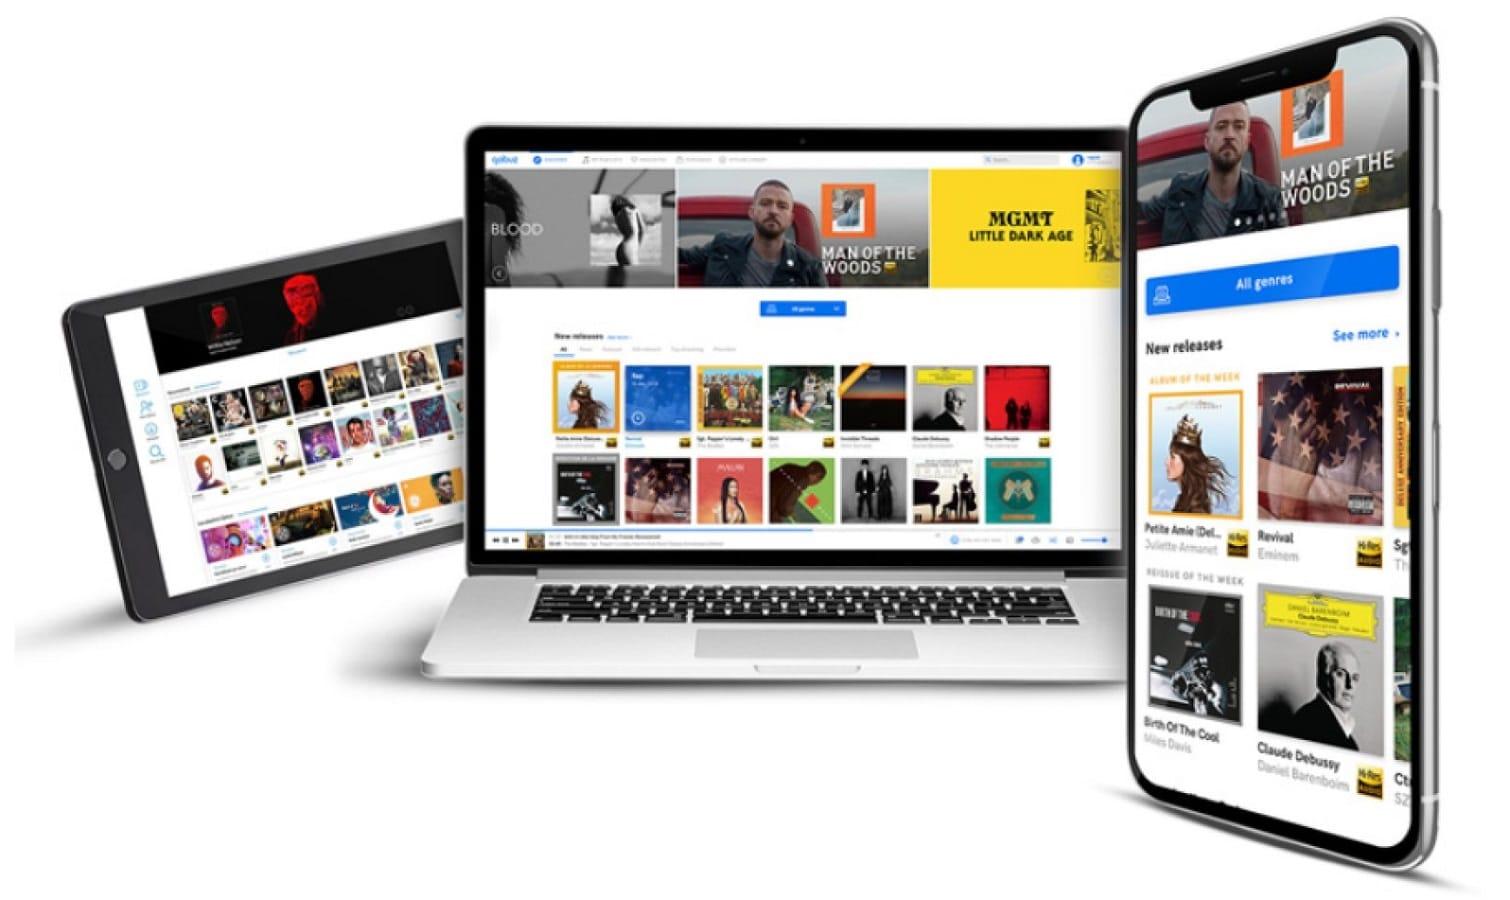 qobuz high quality audio streaming